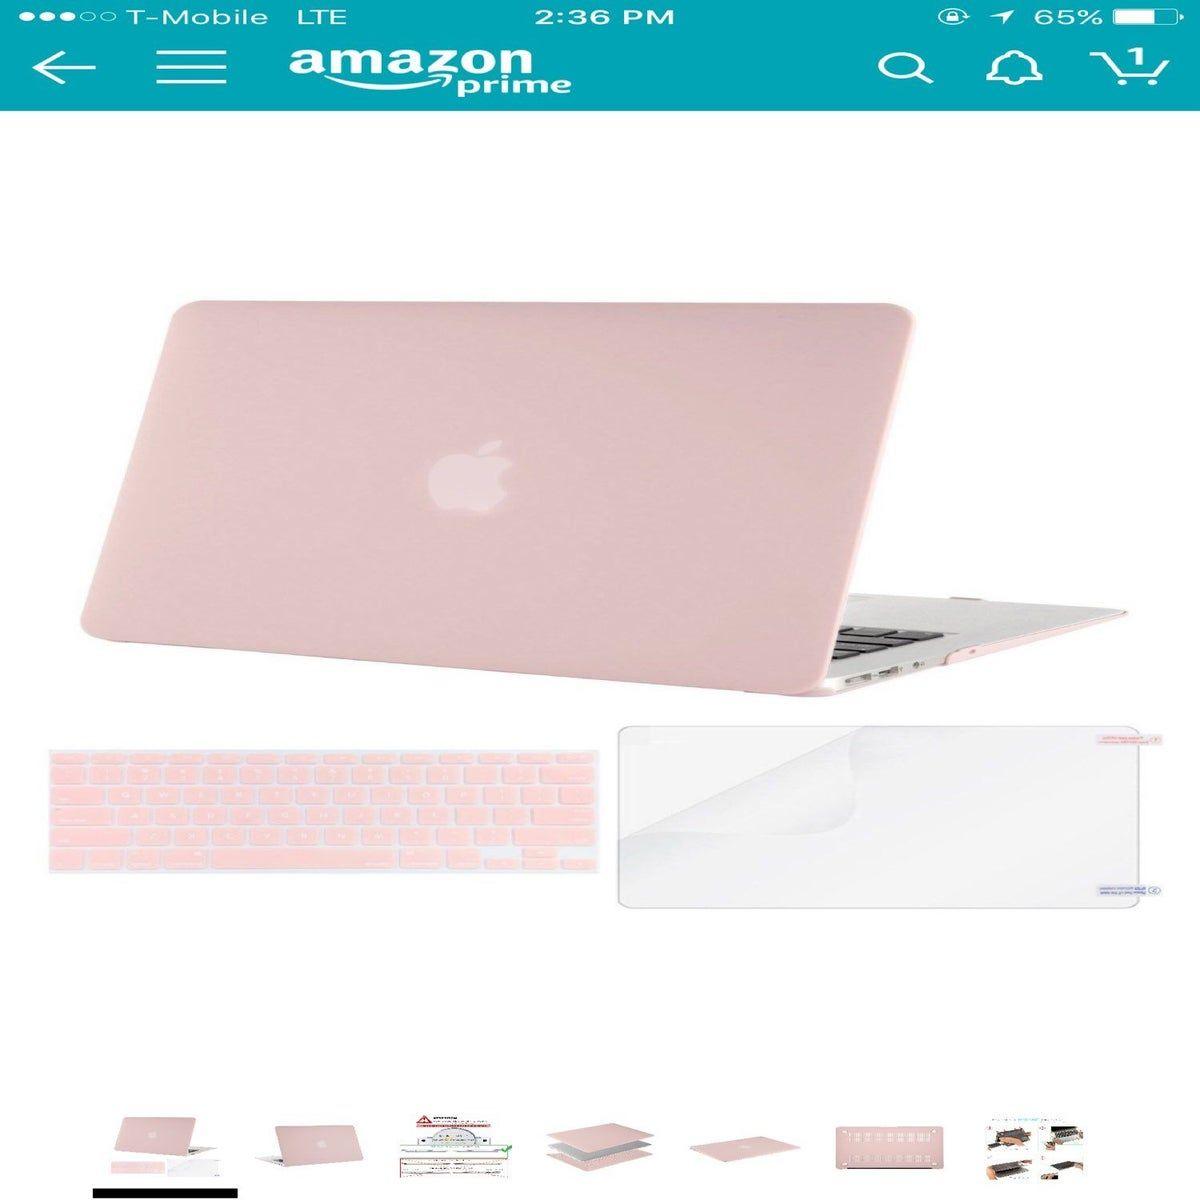 MacBook Air 11 Inch Case on Mercari